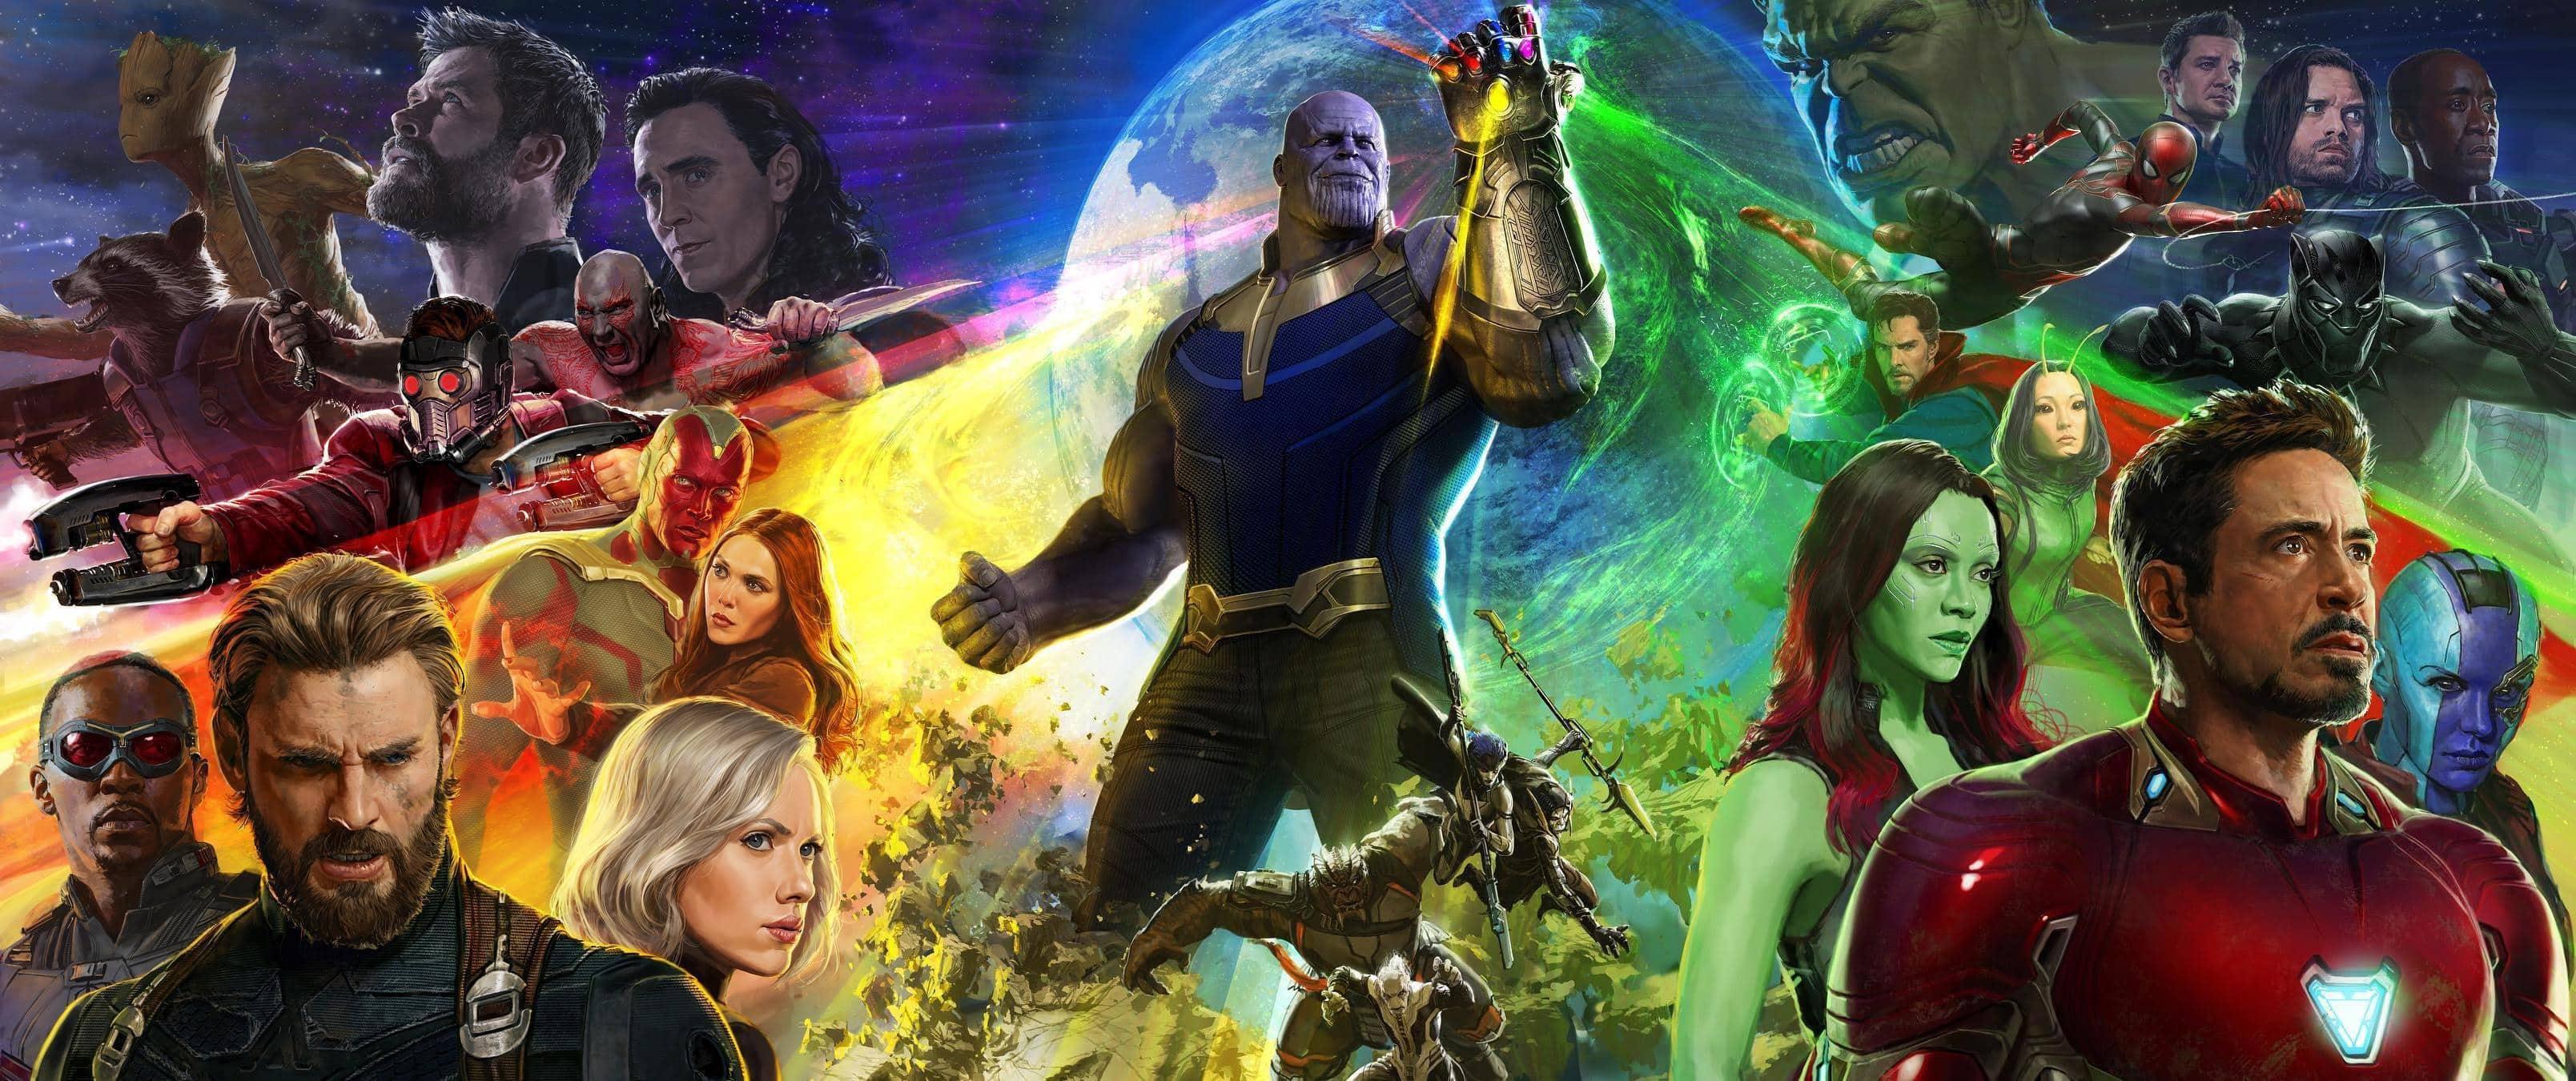 avengers: infinity war, deadpool 2, aquaman: all the superhero movi